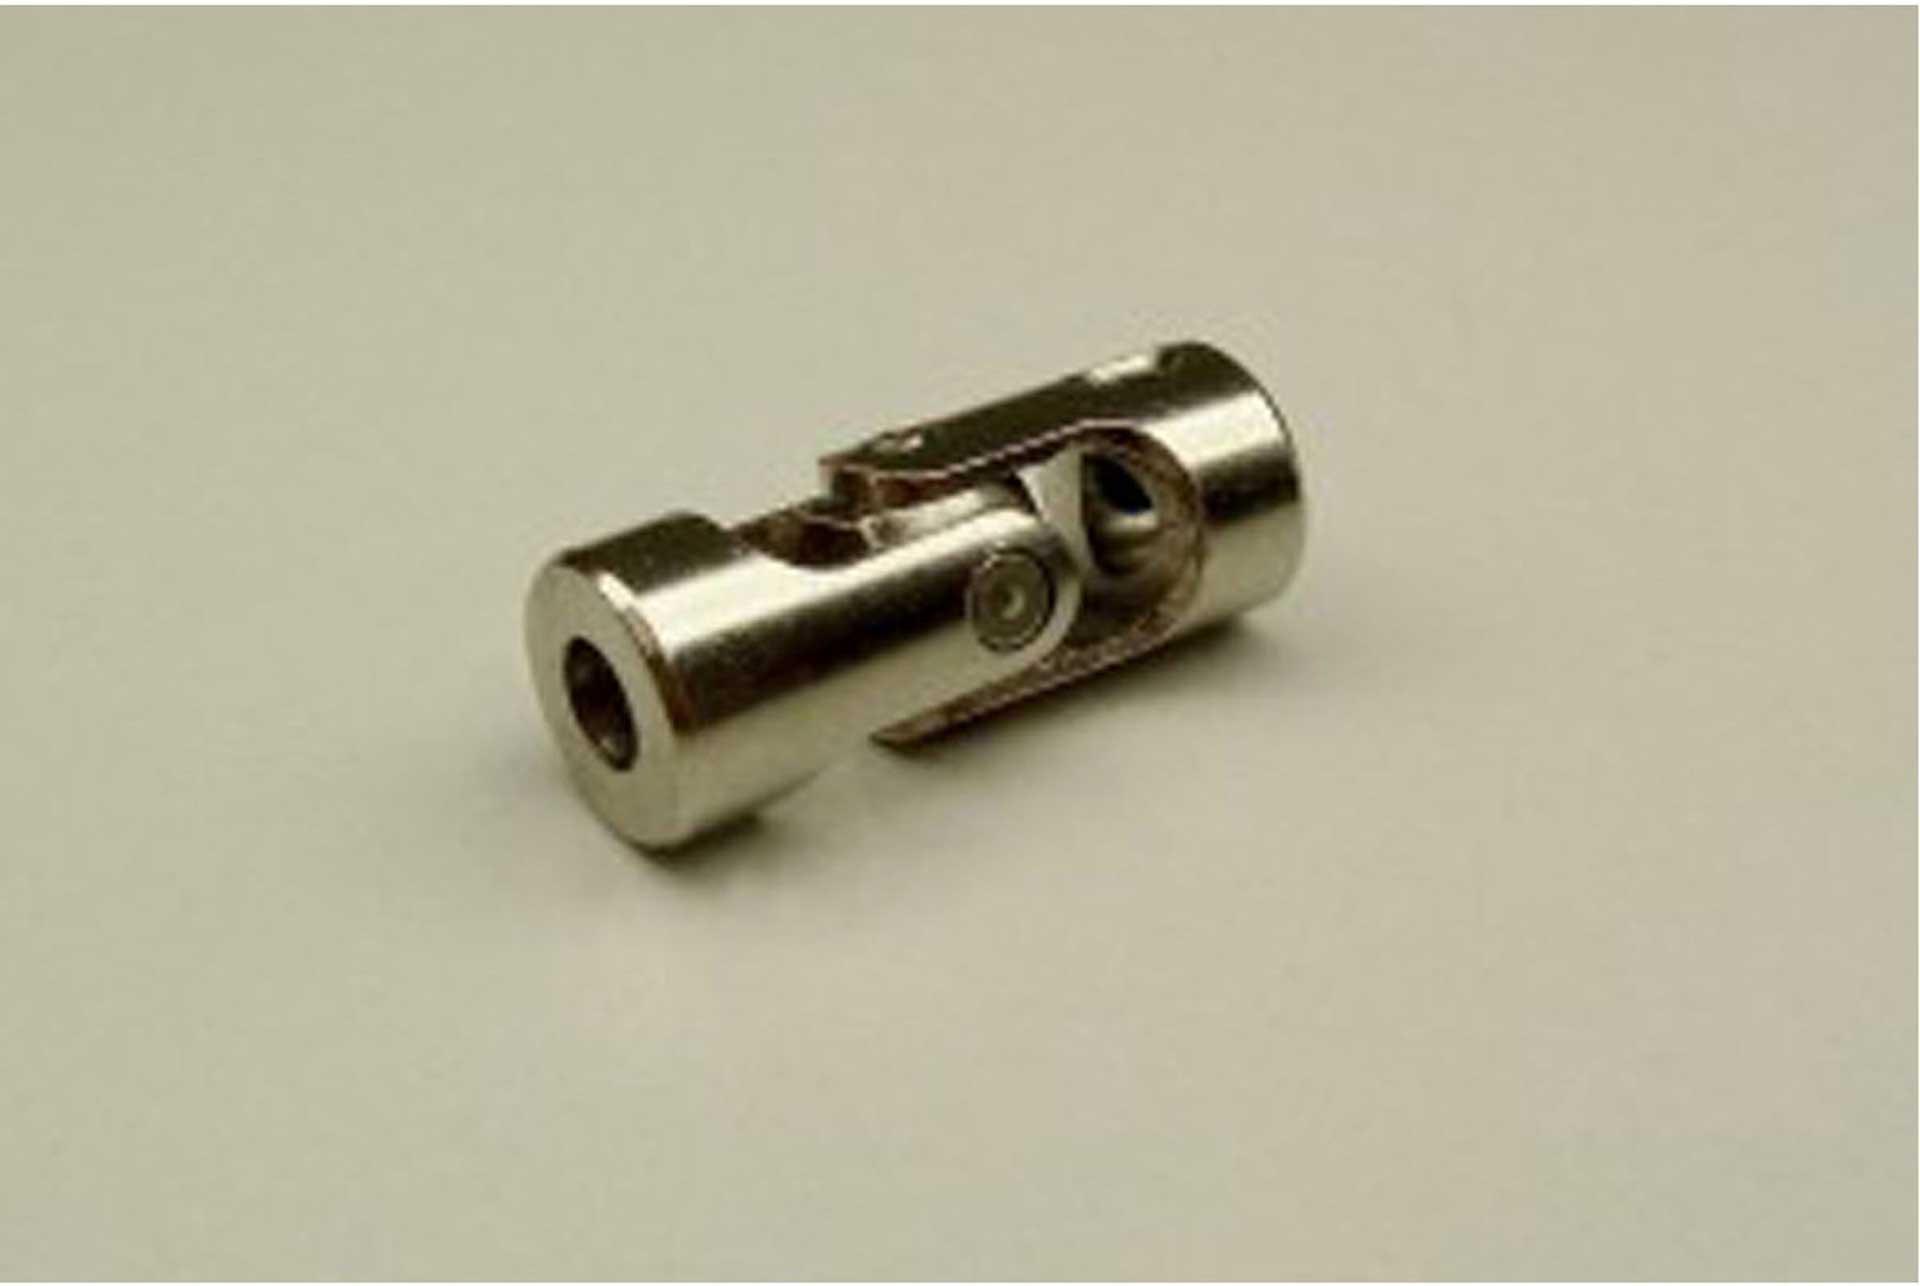 Robbe Modellsport RO-NAVY Gelenkkupplung Stahl DM 9mm L 23mm 1Stk.